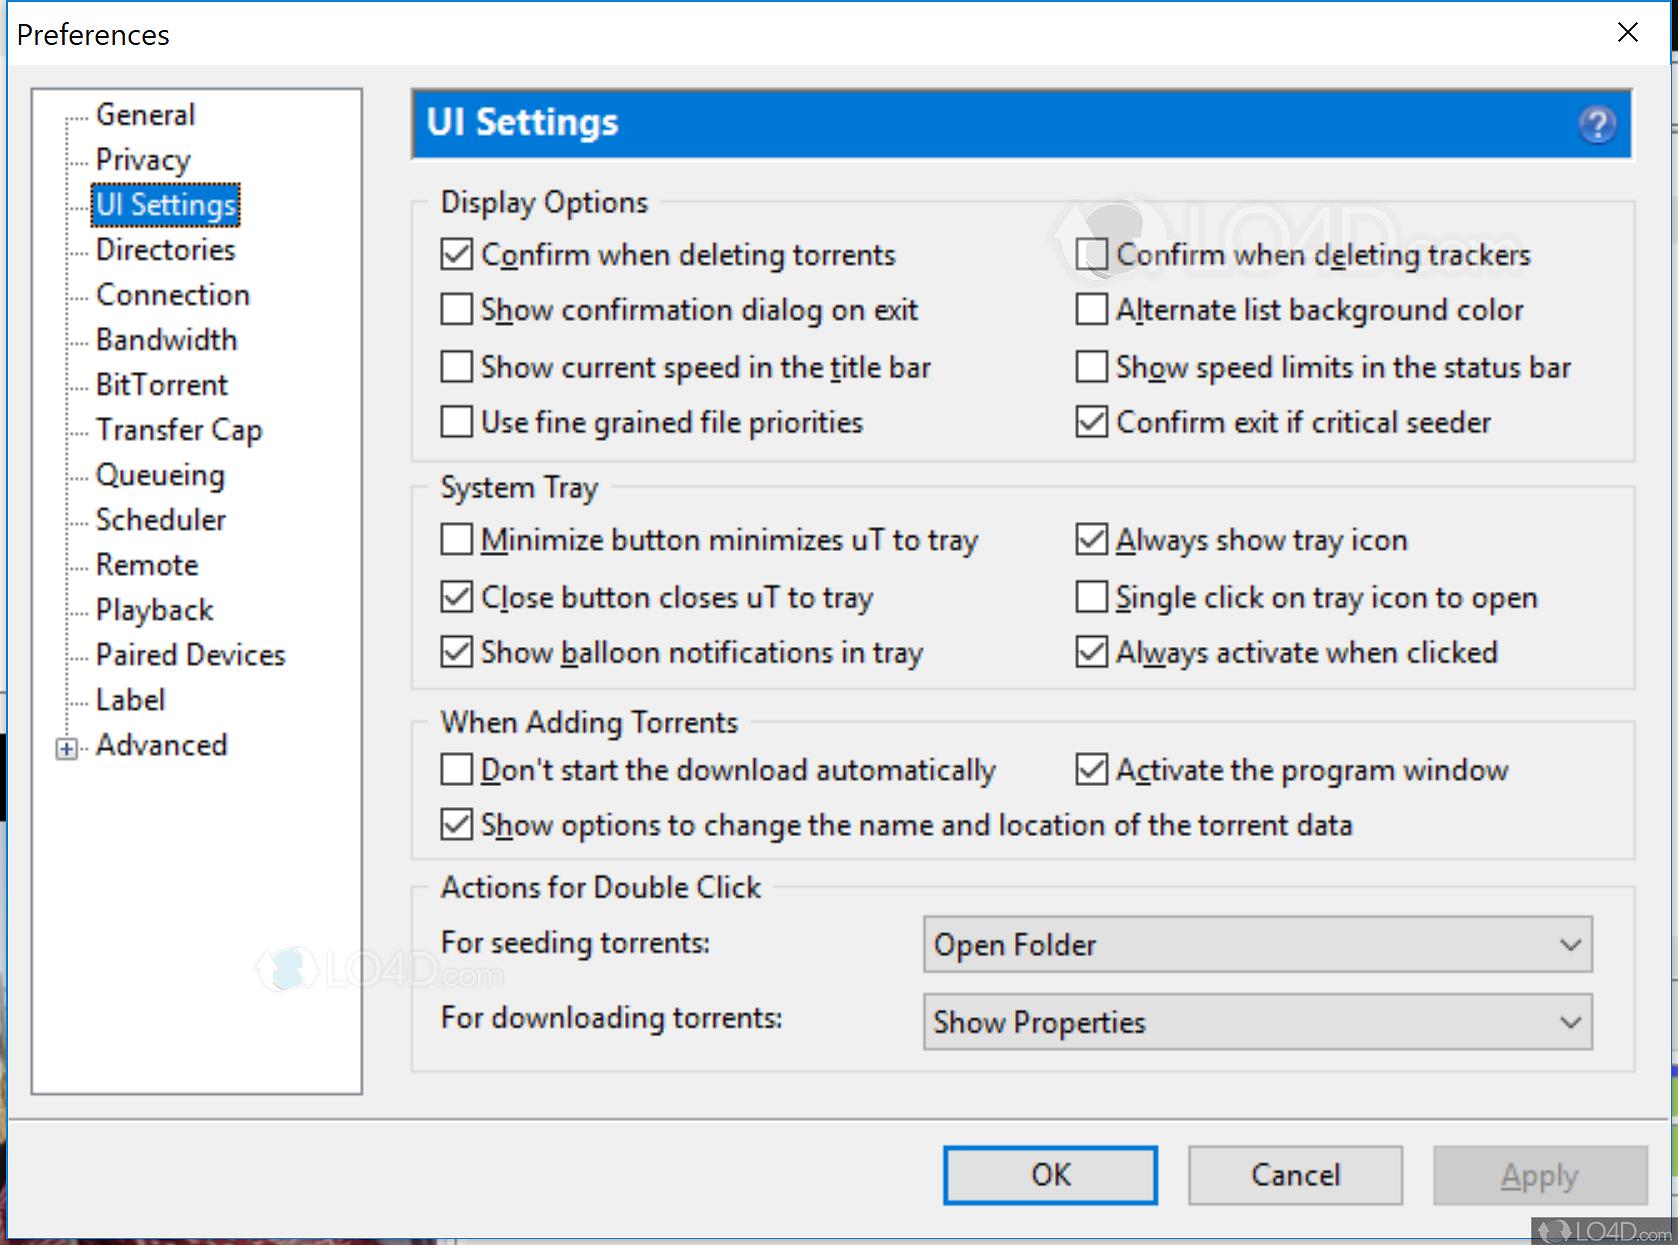 utorrent download free for pc 64 bit windows 10